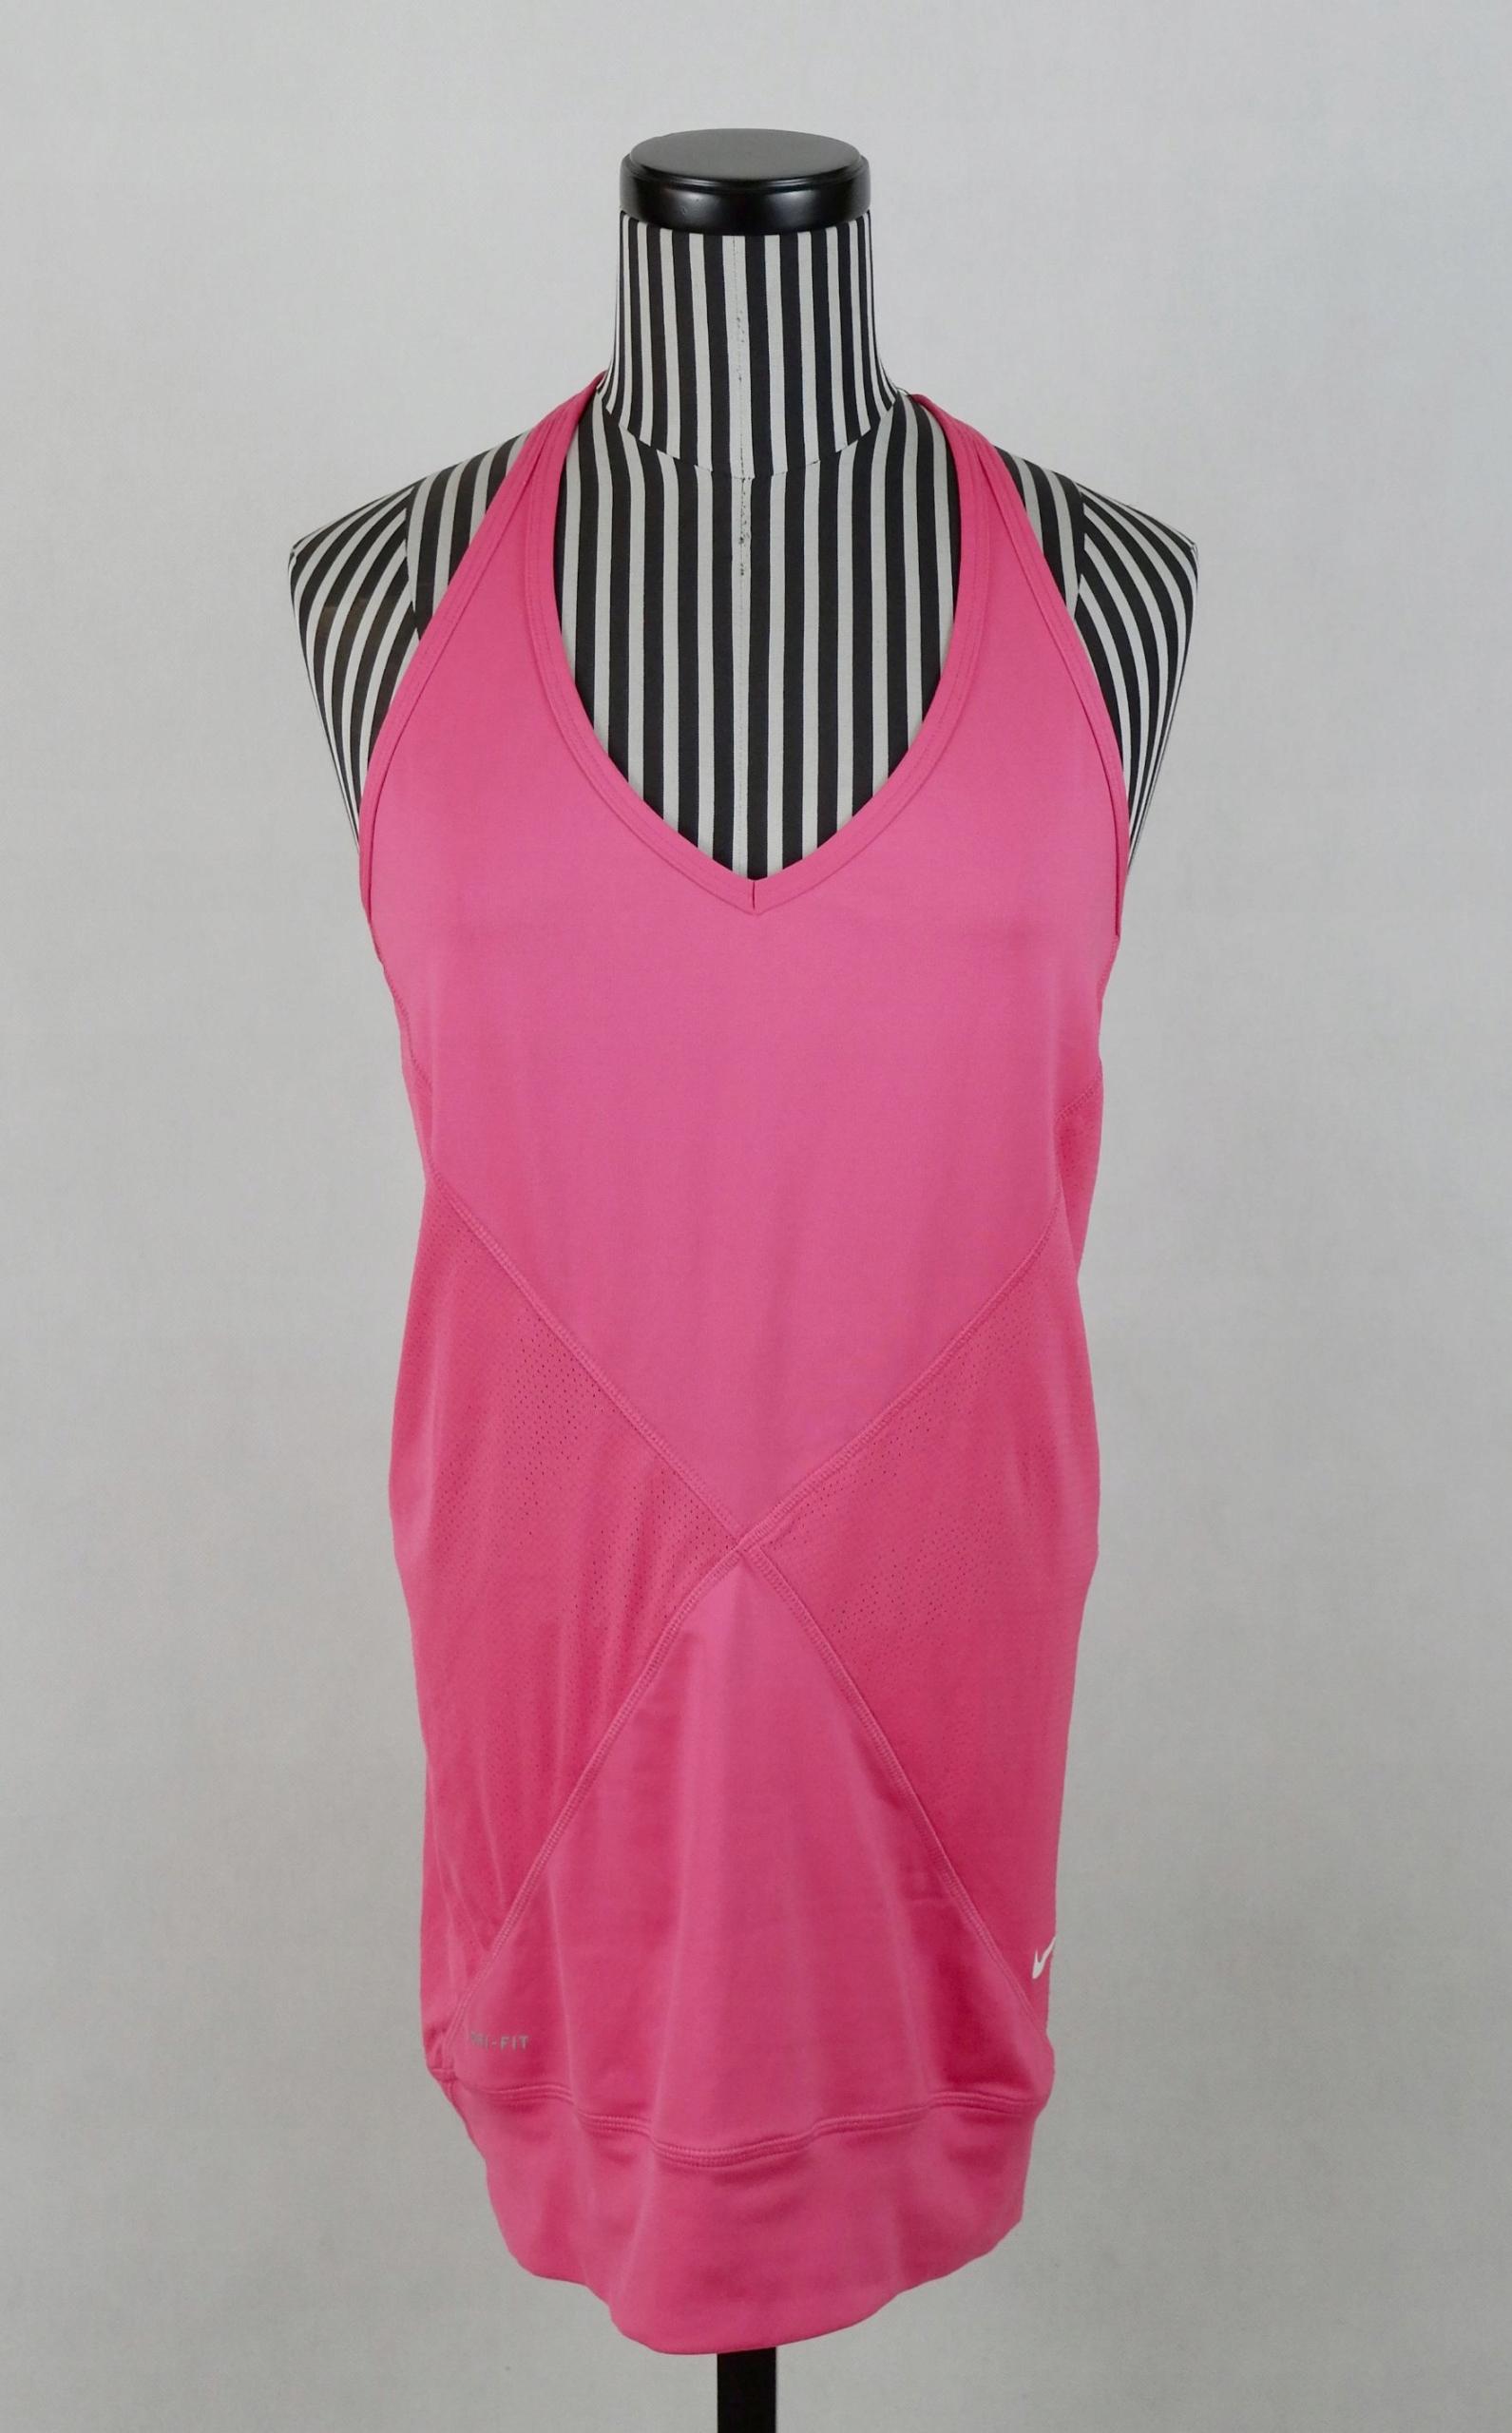 NIKE koszulka top bokserka DRI FIT różowa S